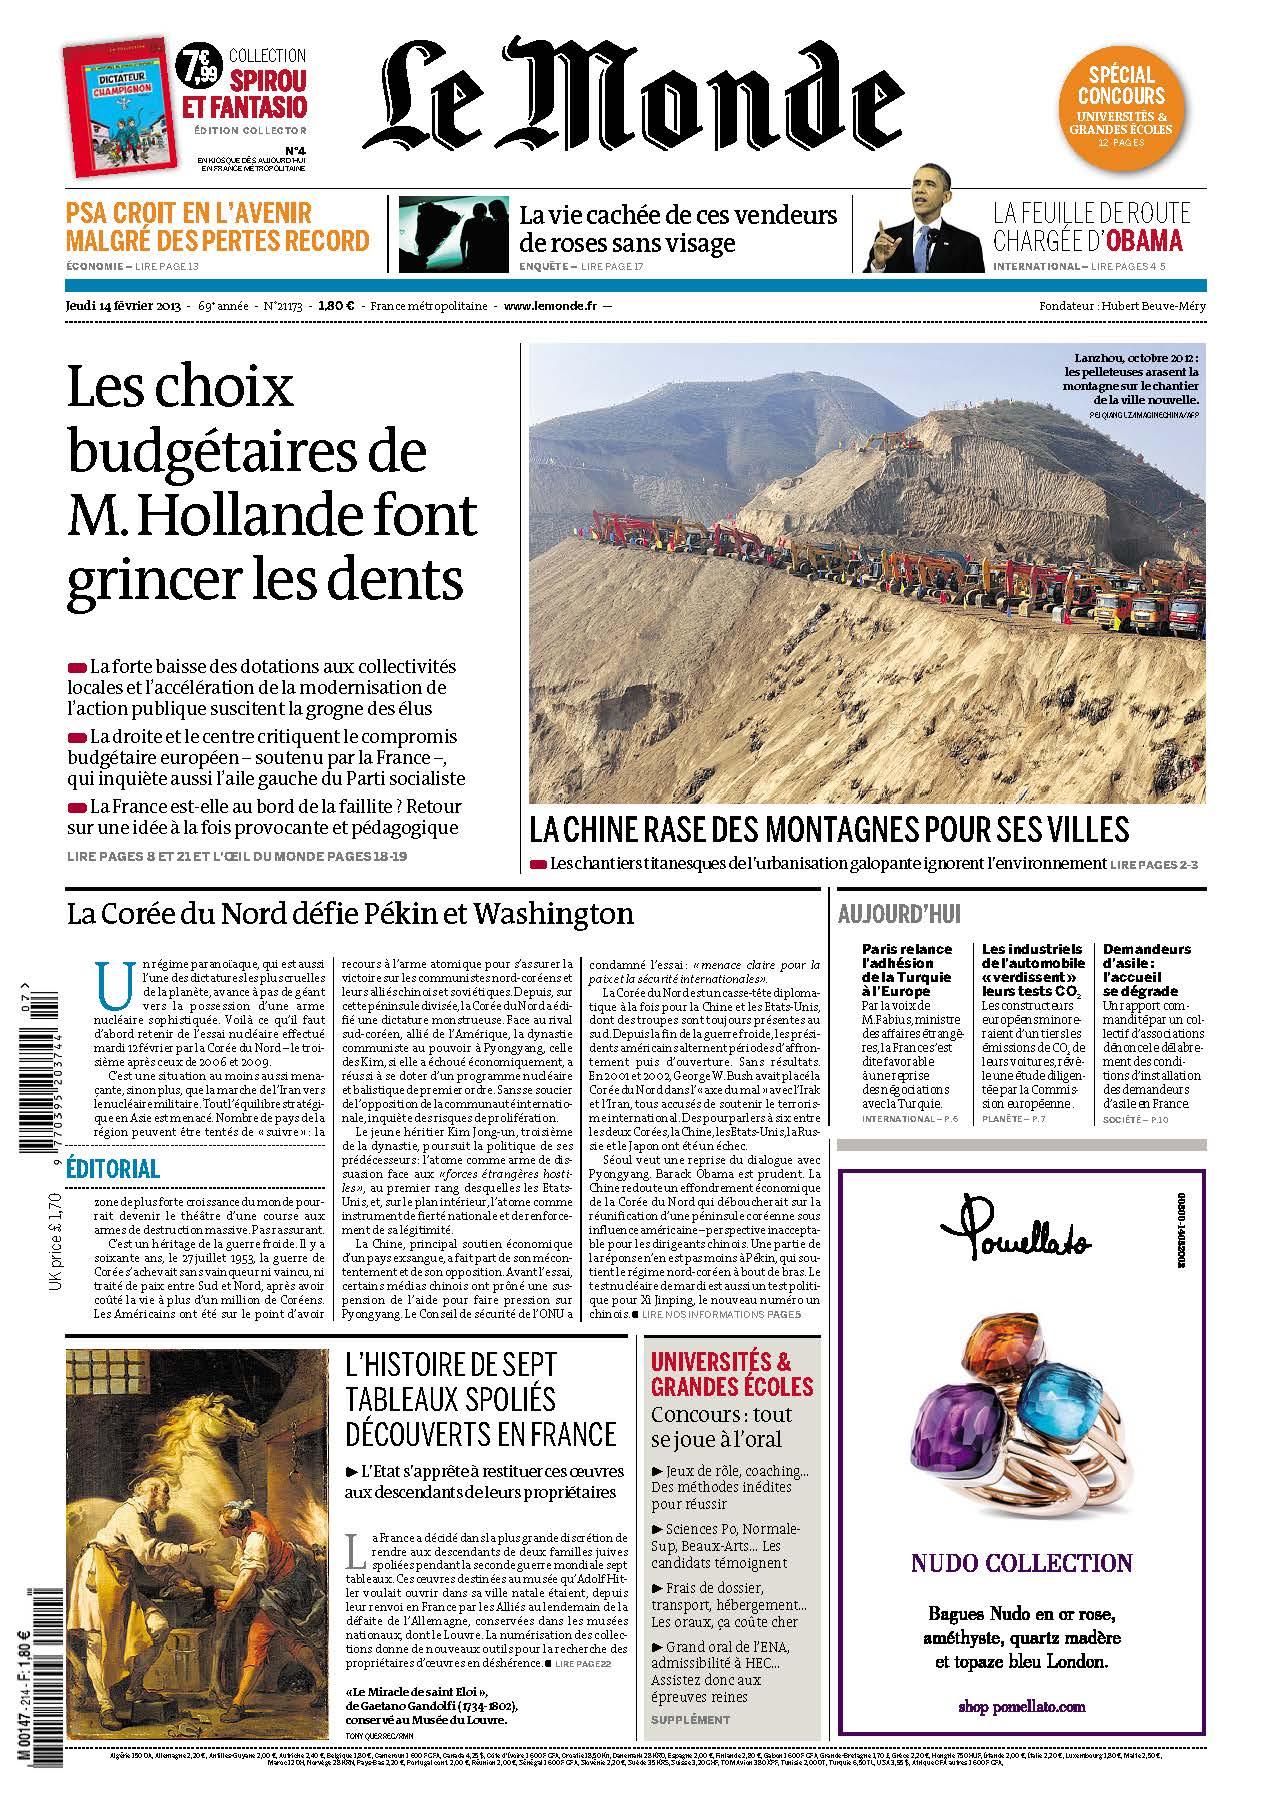 Le Monde Jeudi 14 février 2013